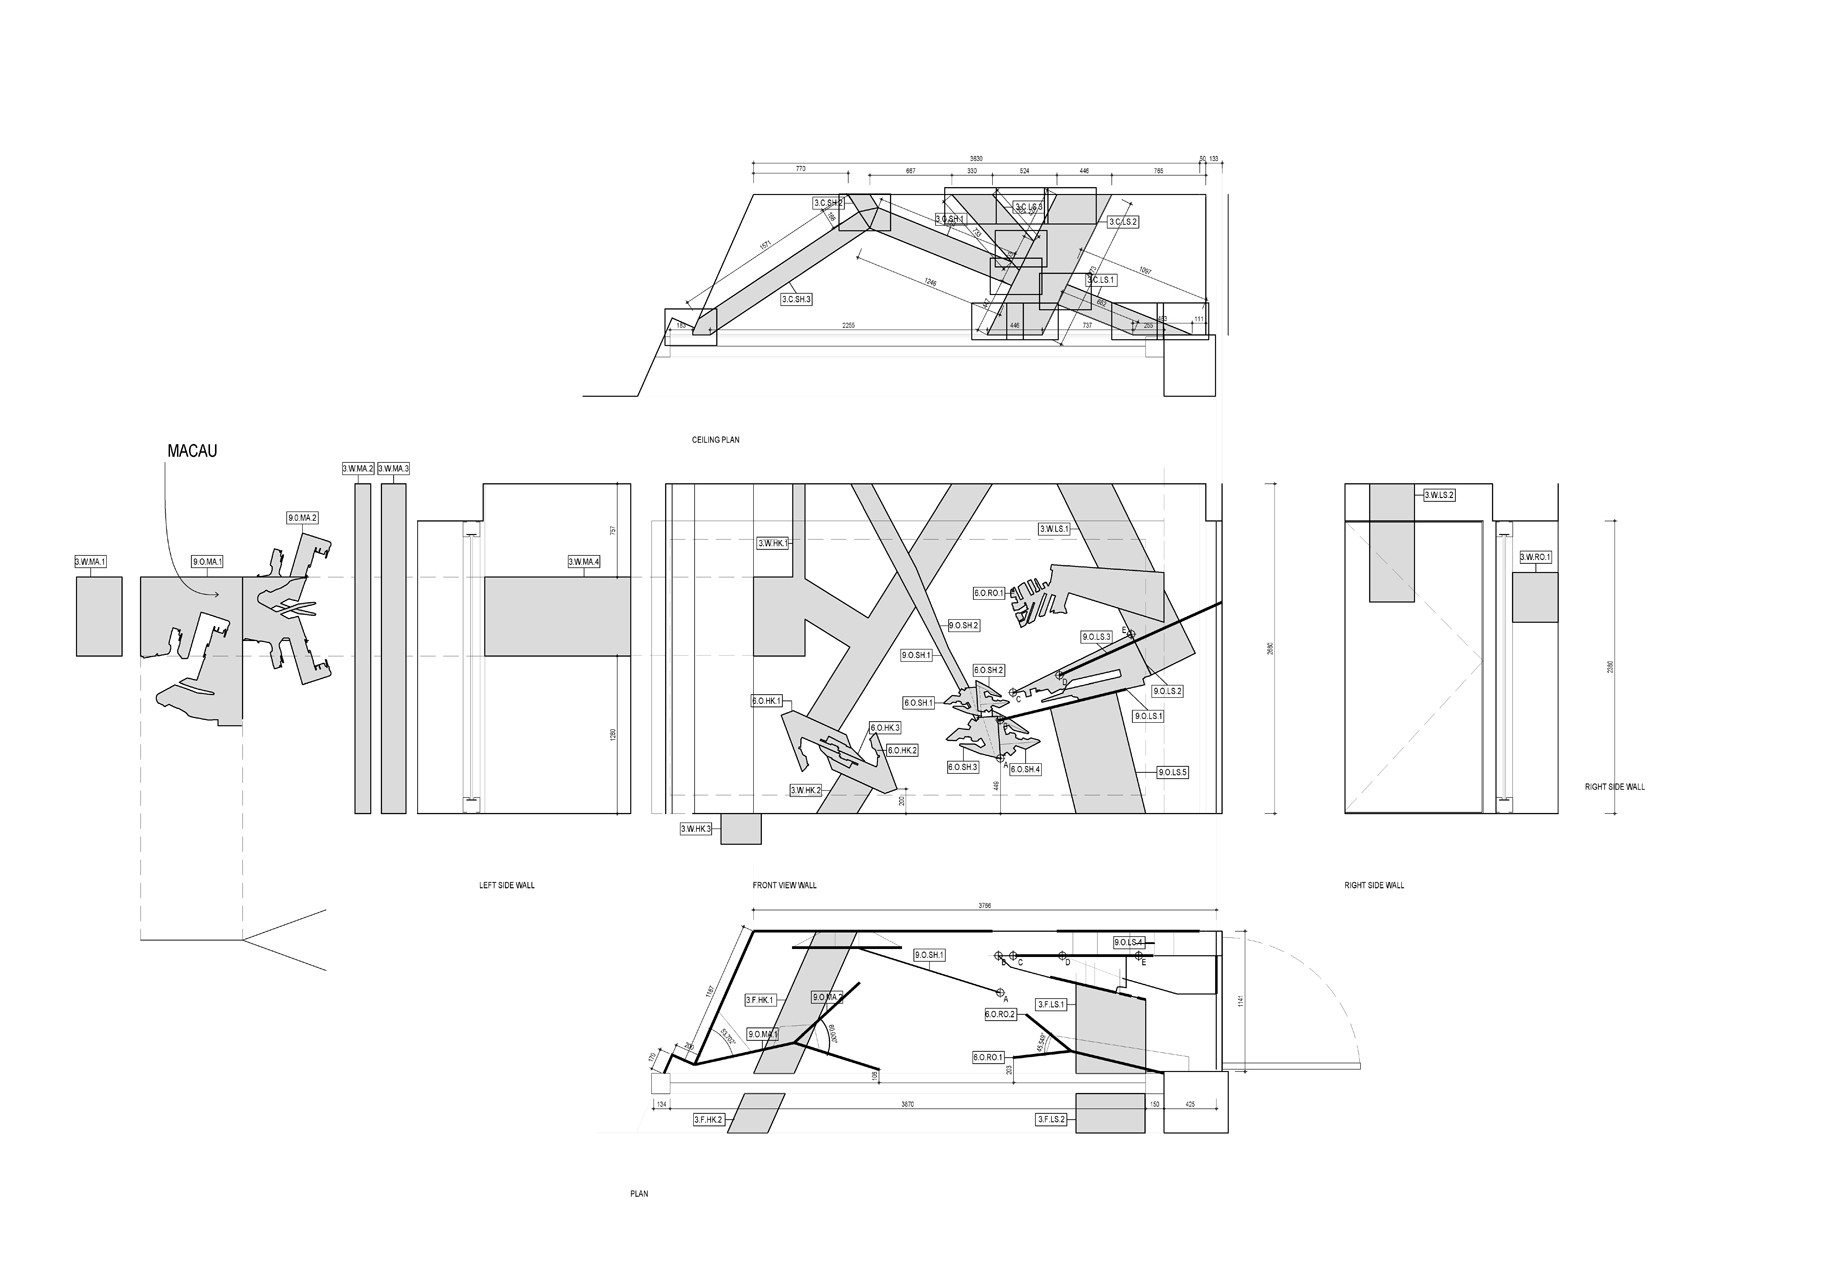 drawing_infra_macau_studiofrankhavermans_by_impromptu_2